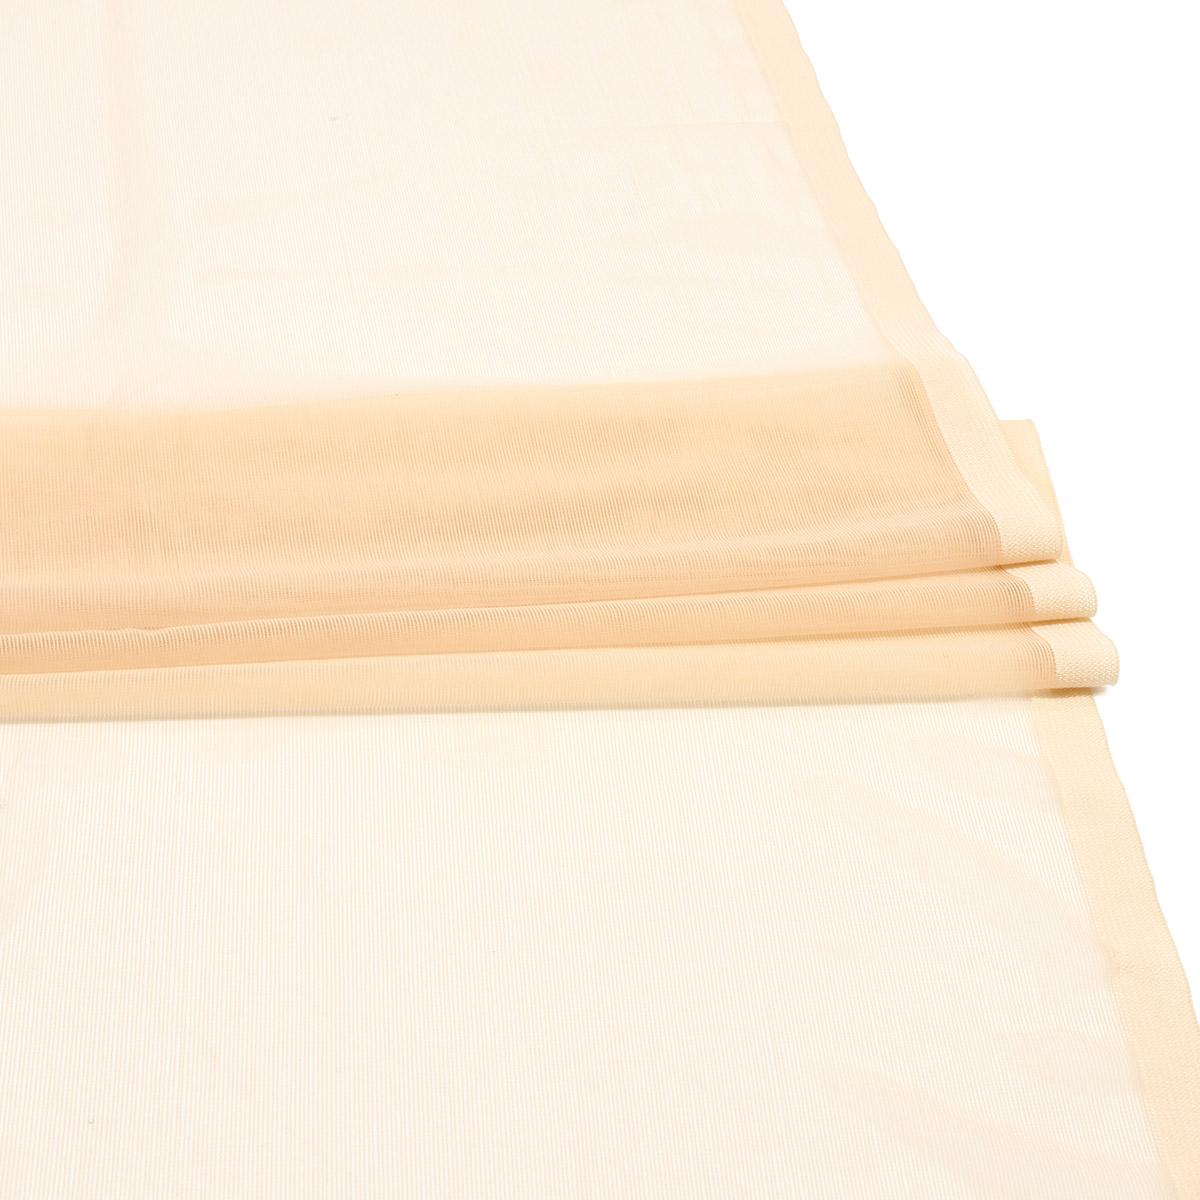 SU 90 Ткань эластичная бельевая 36 см*10